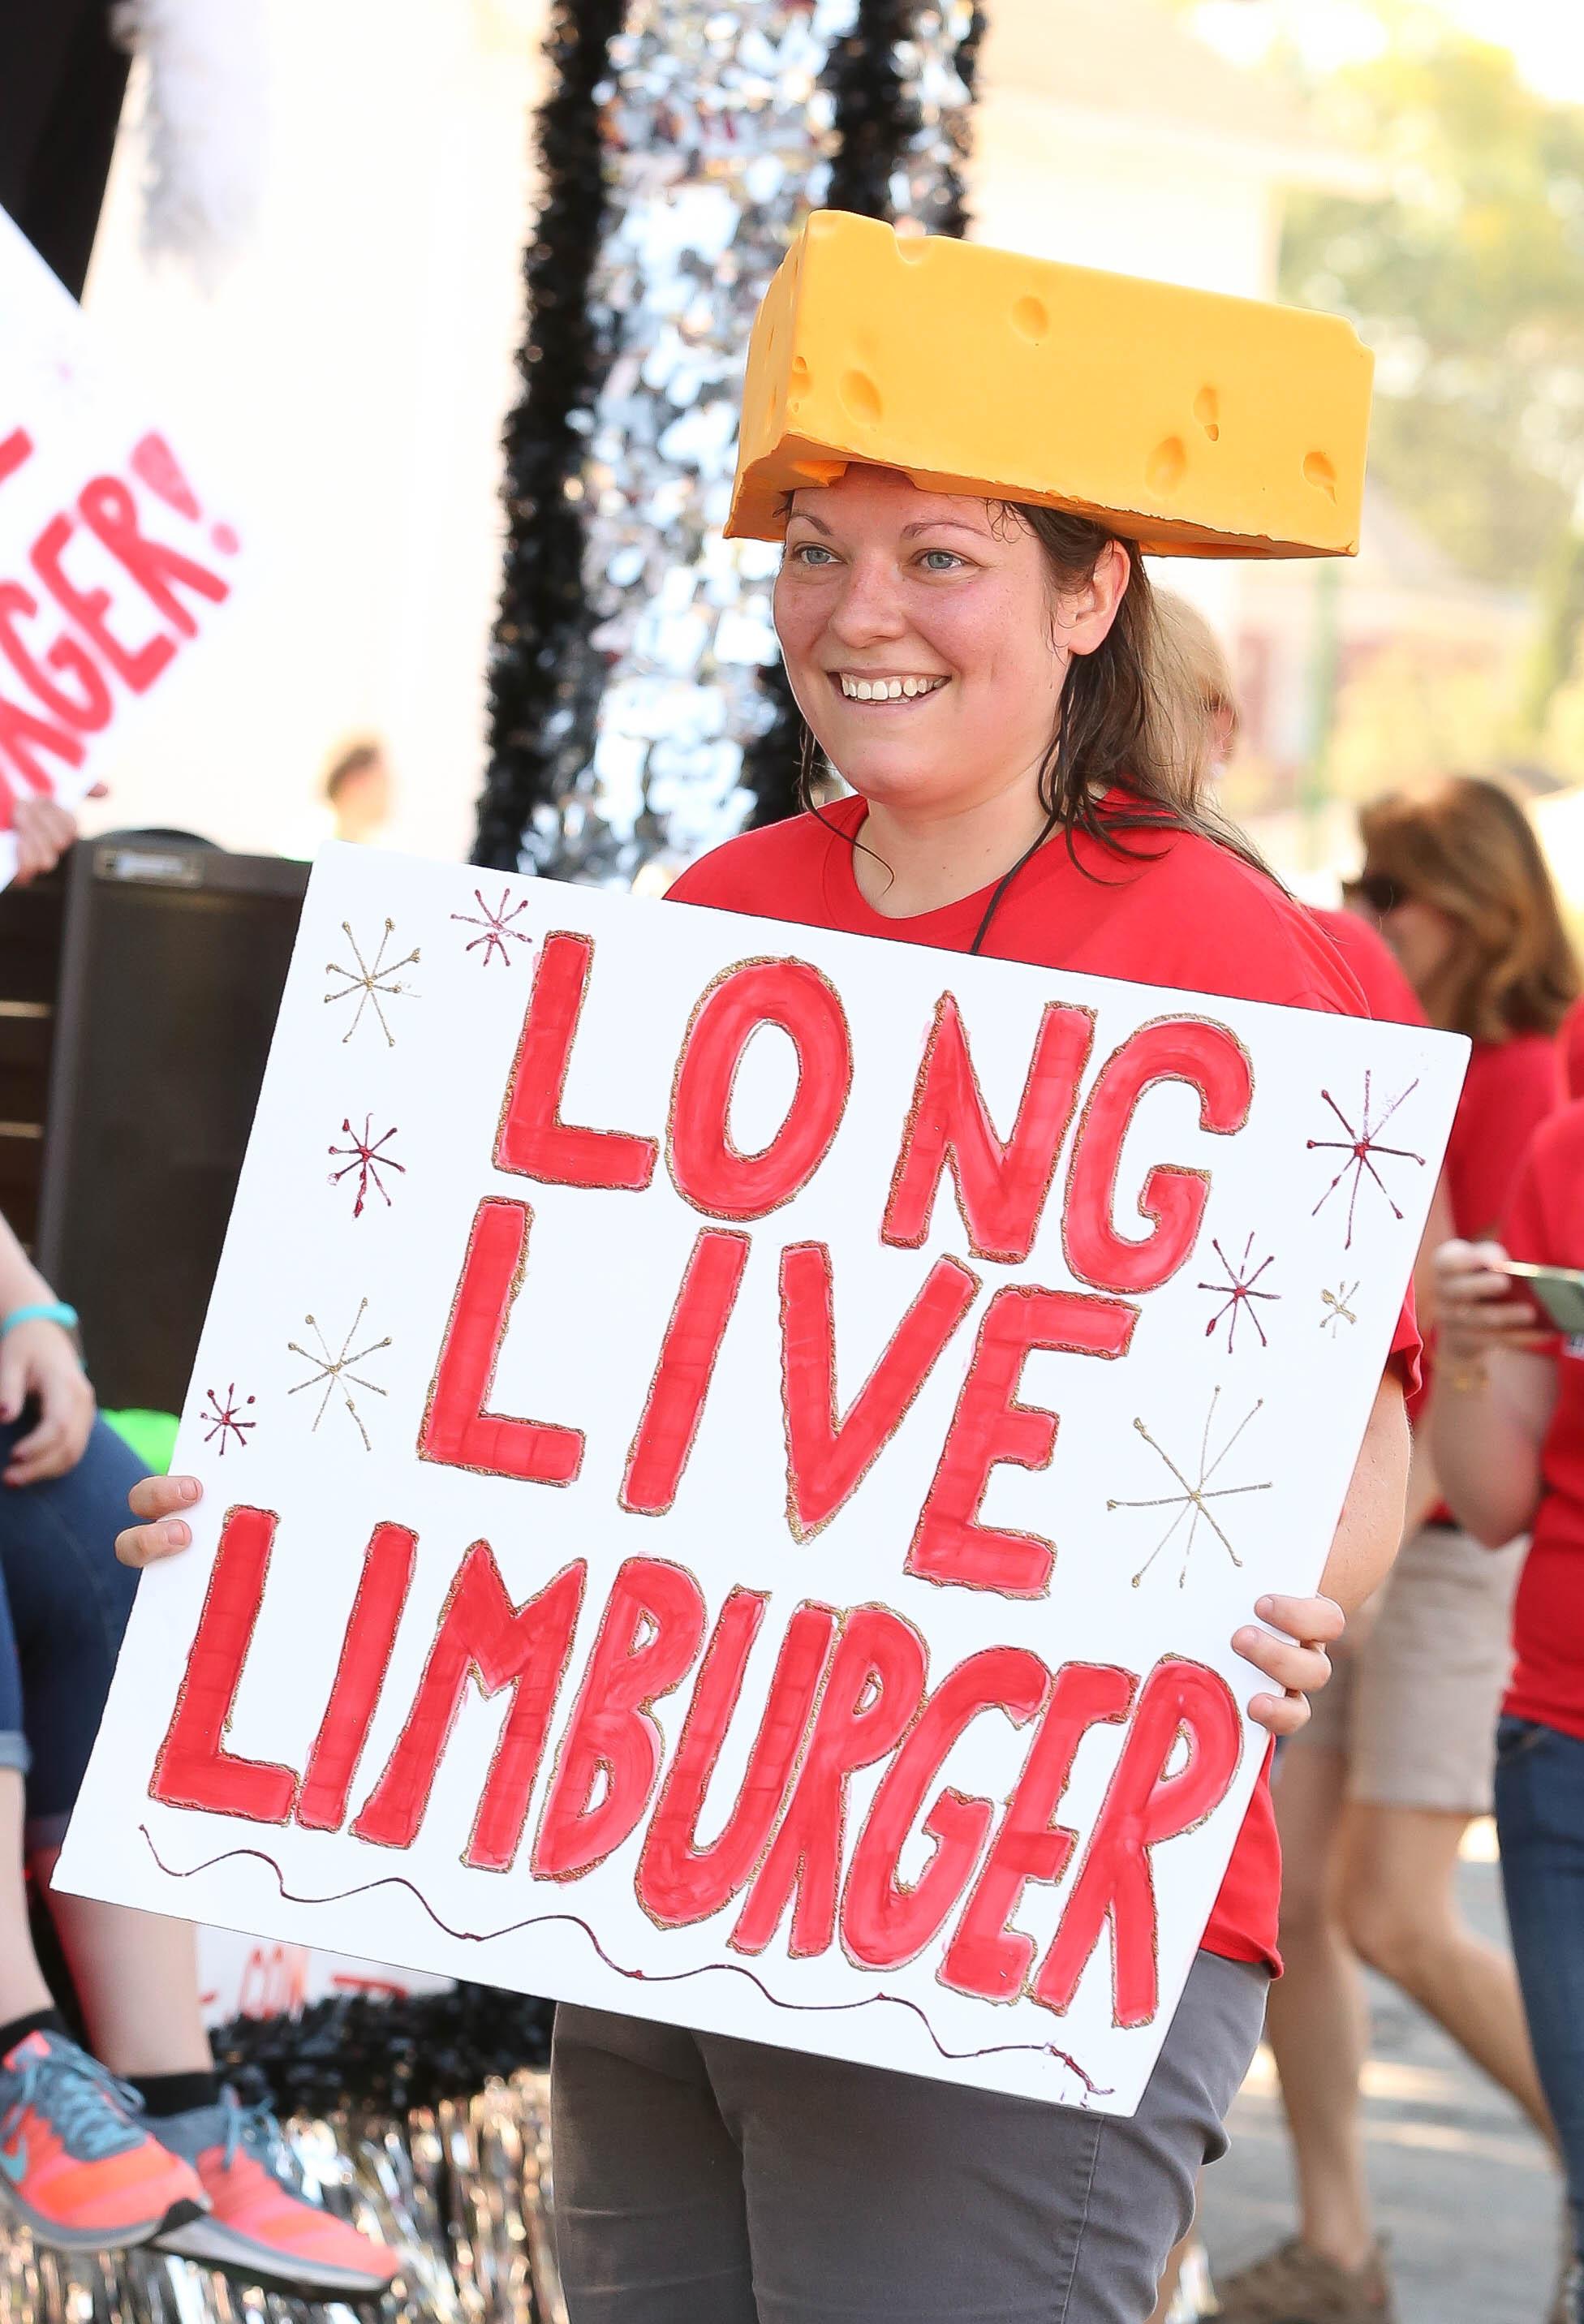 long live limburger.jpg